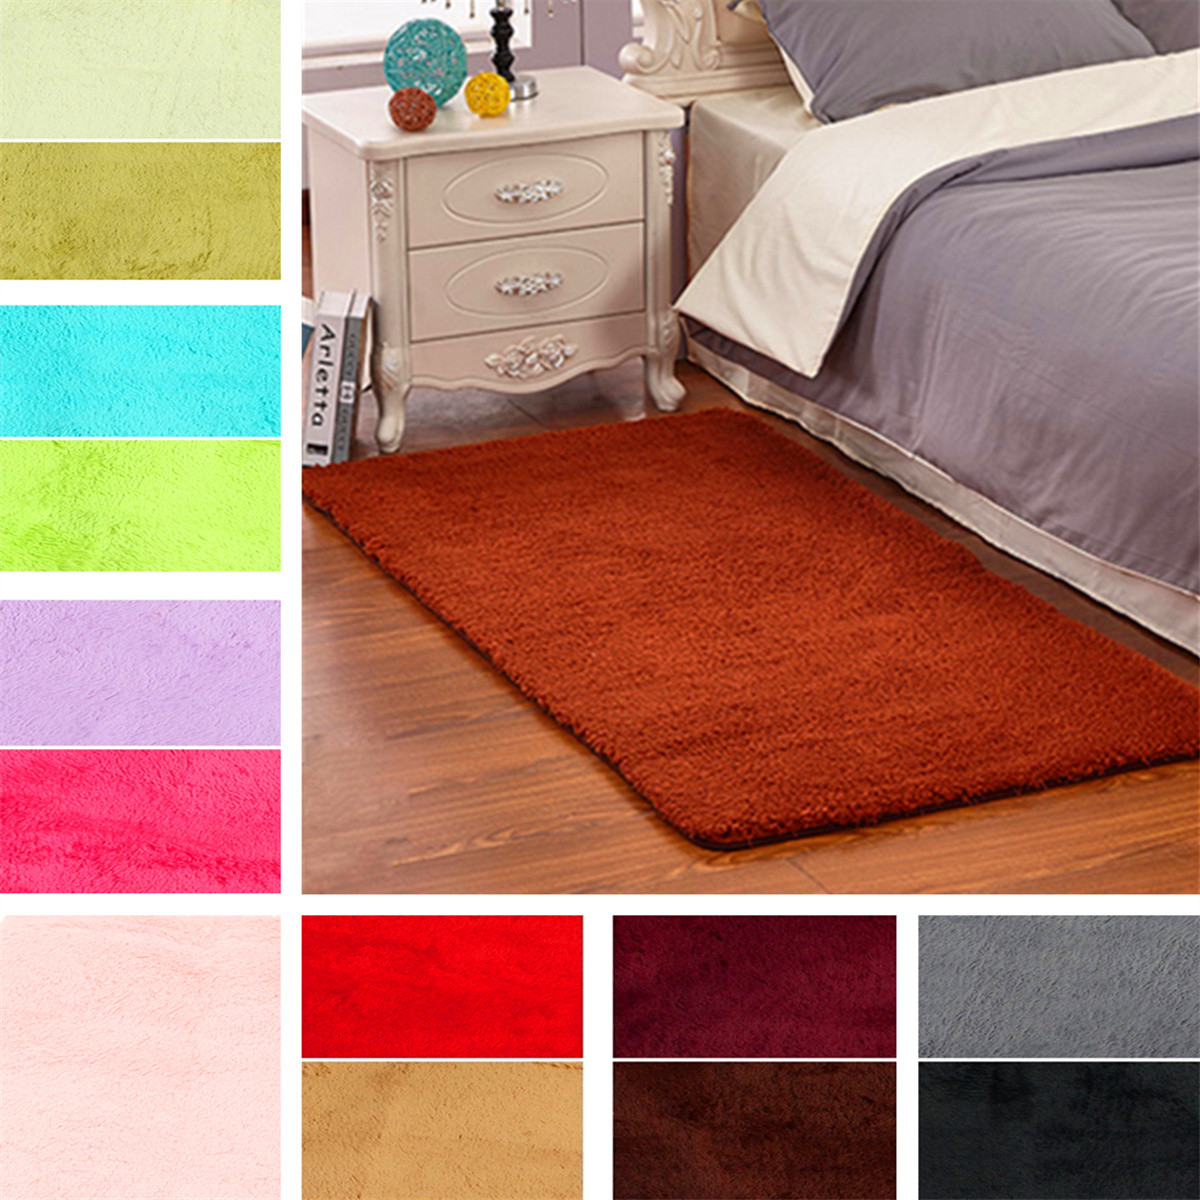 60 X 120cm Anti Skid Shaggy Fluffy Area Rug Bedroom Carpet Floor Mat Parlor Decor